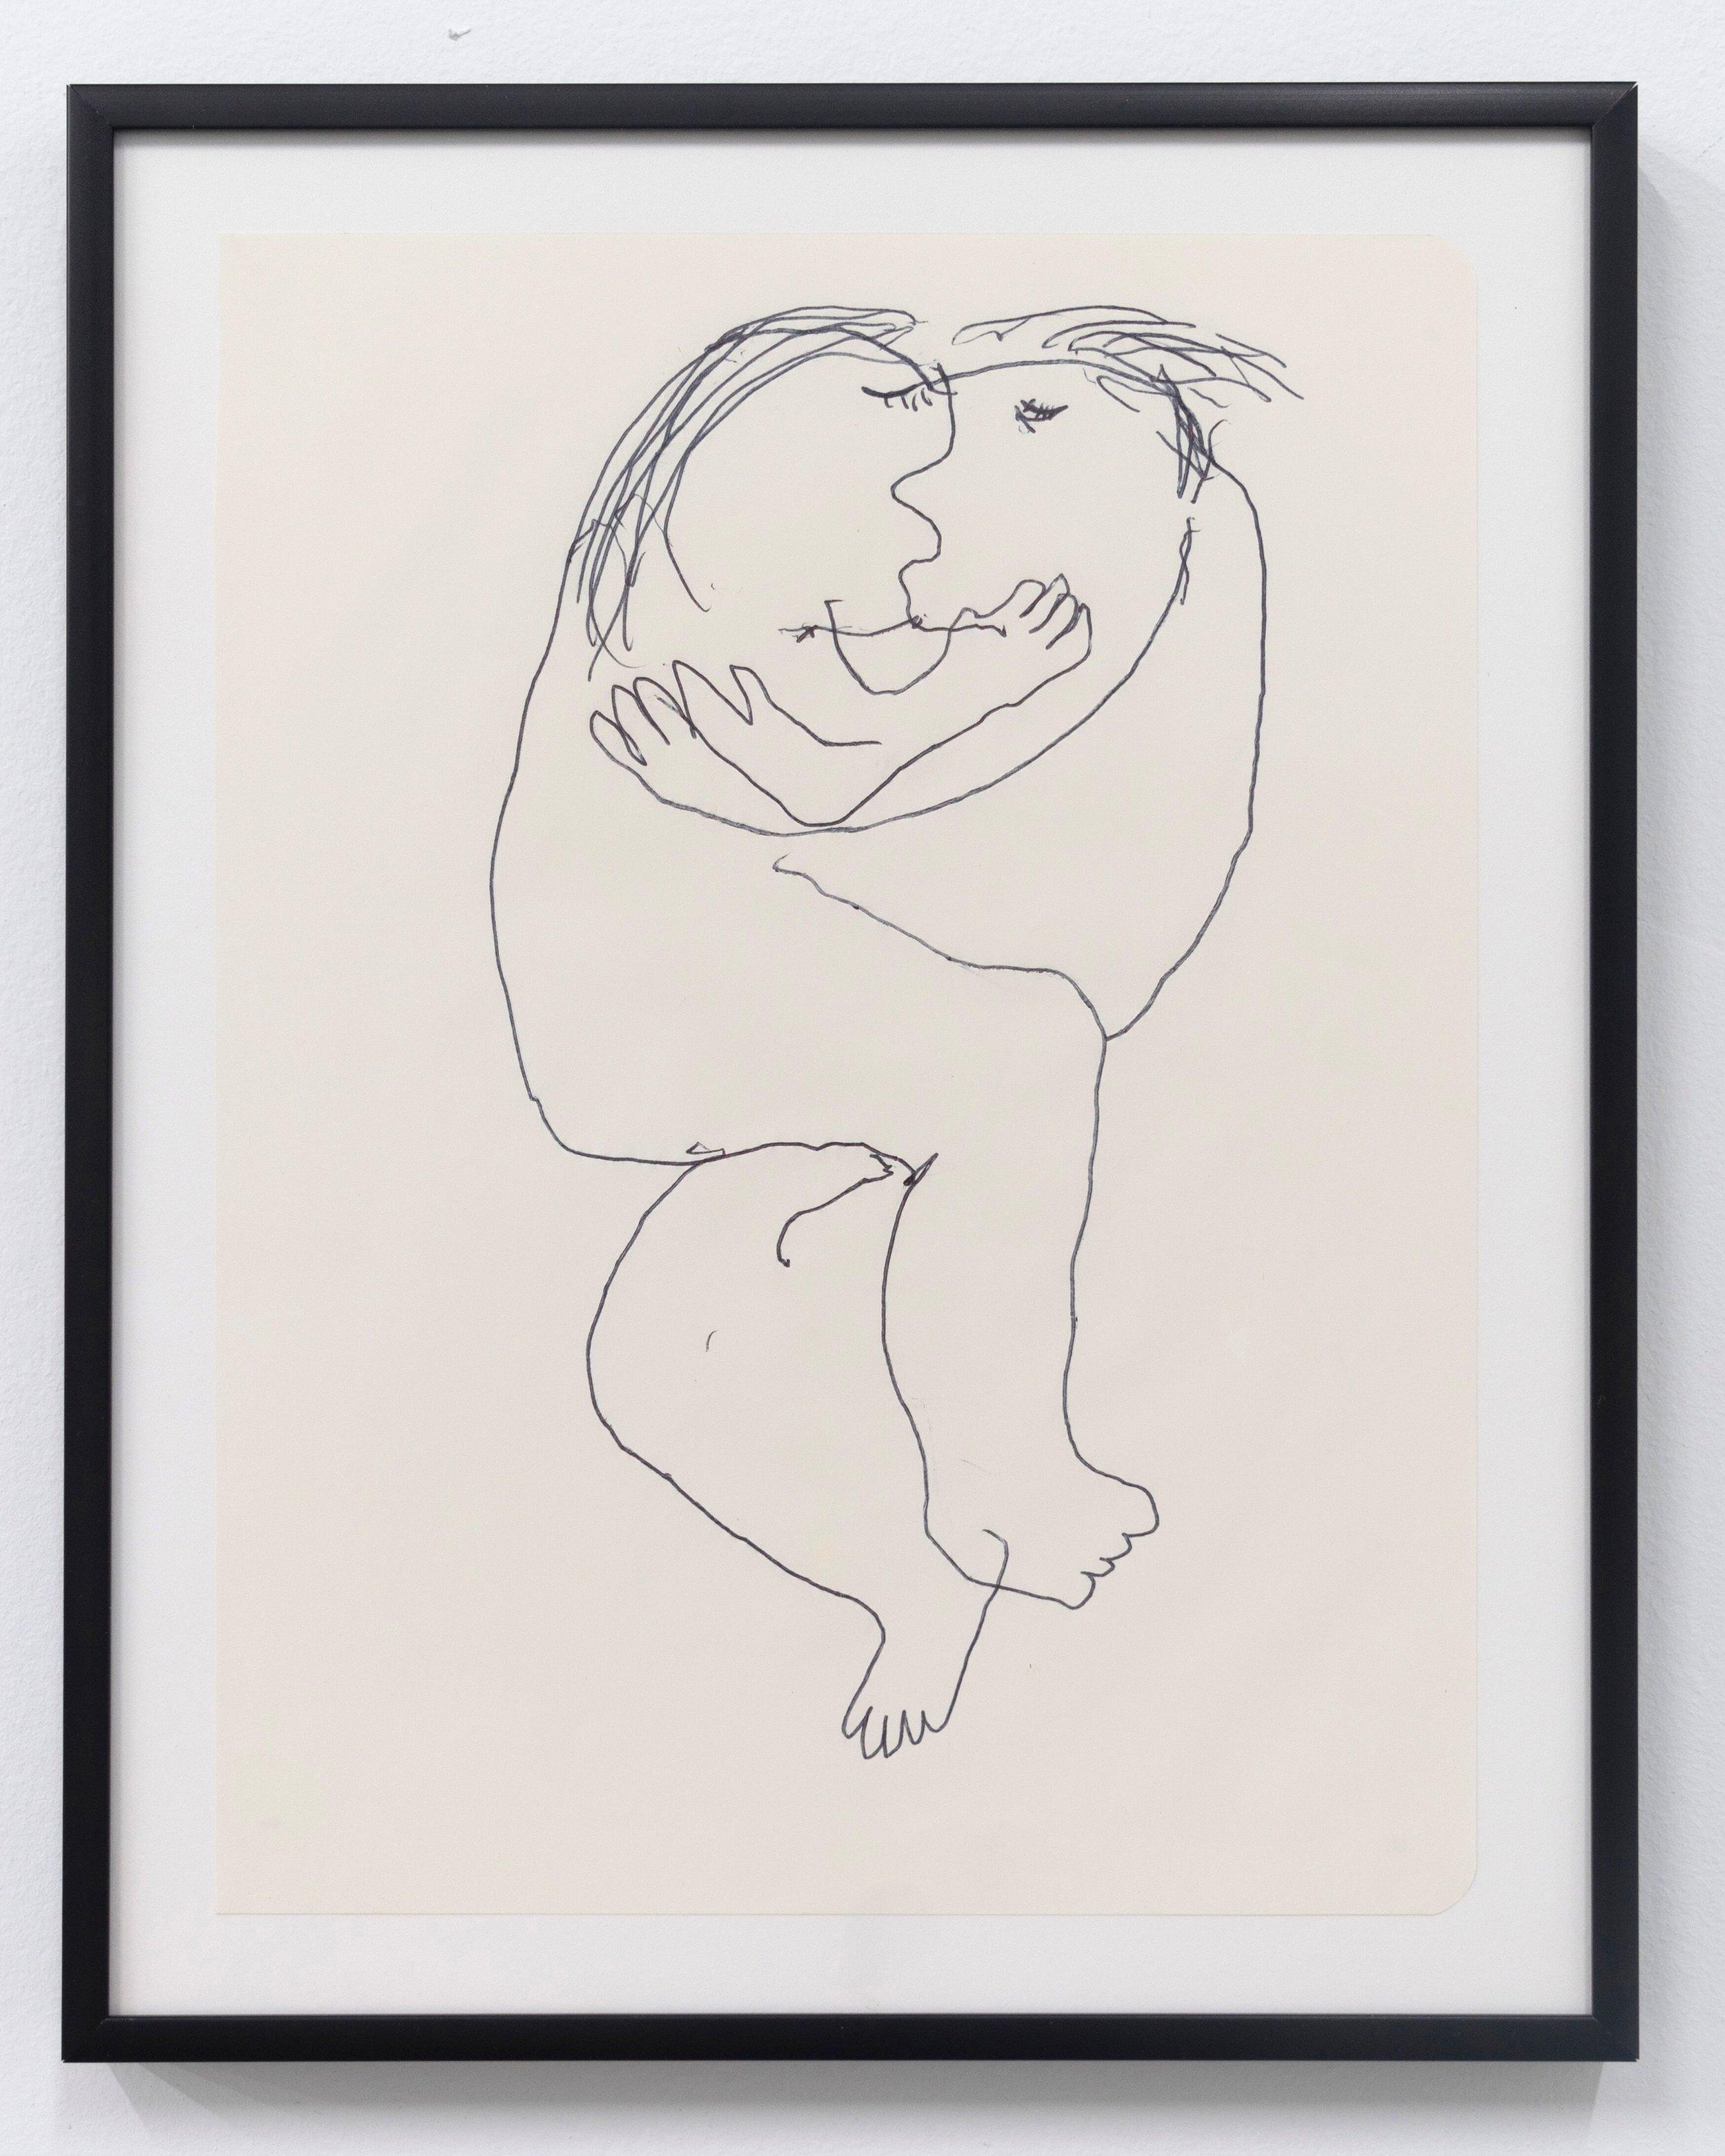 Emilie Gossiaux    The kiss , 2018 Ink on newsprint   11 1/2 x 9 1/8 inches 29.2 x 23.2 cm